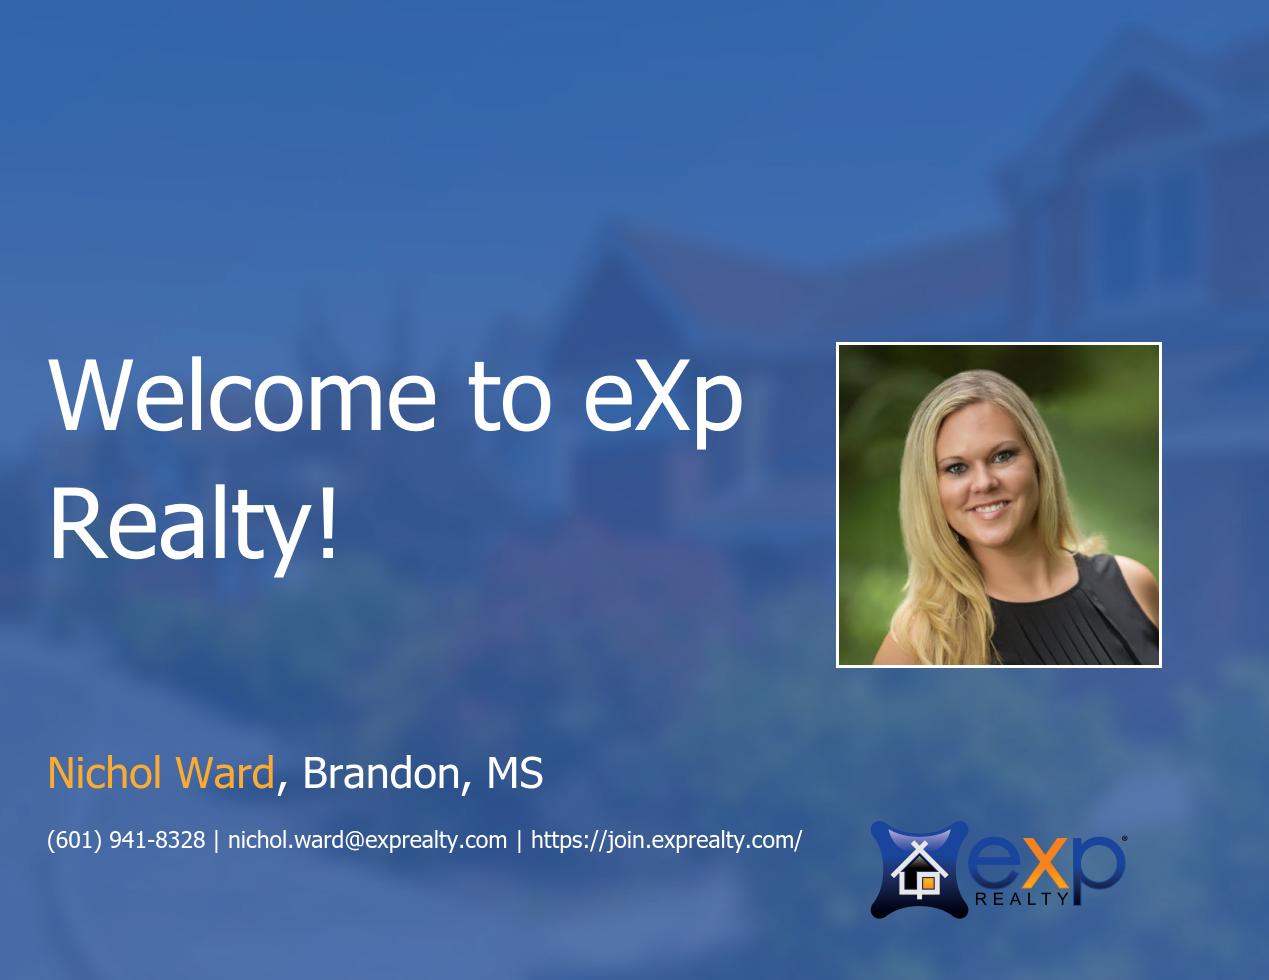 eXp Realty Welcomes Nichol Ward!